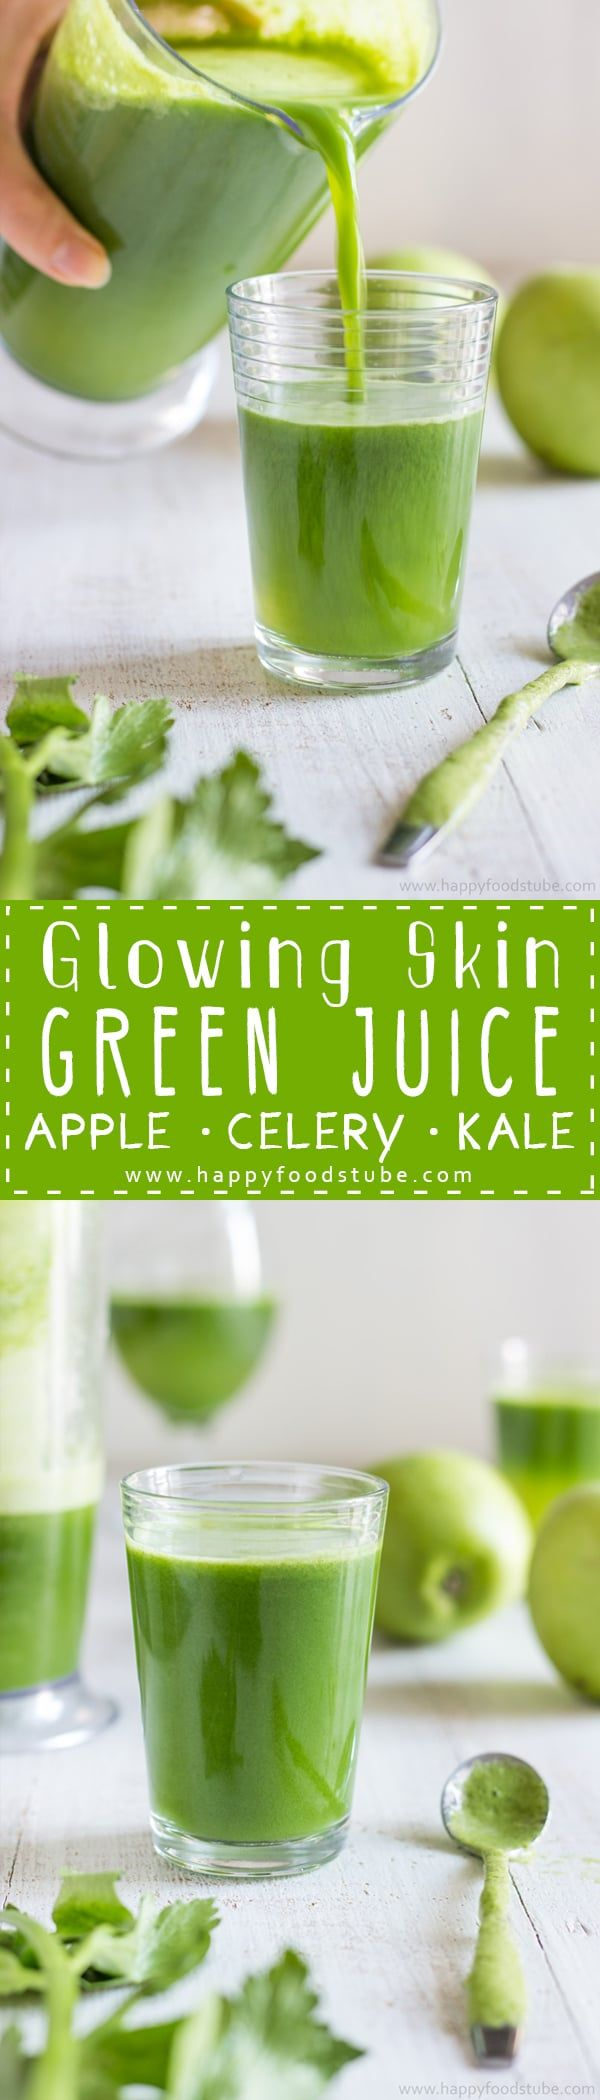 Glowing Skin Green Juice Recipe Green juice recipes